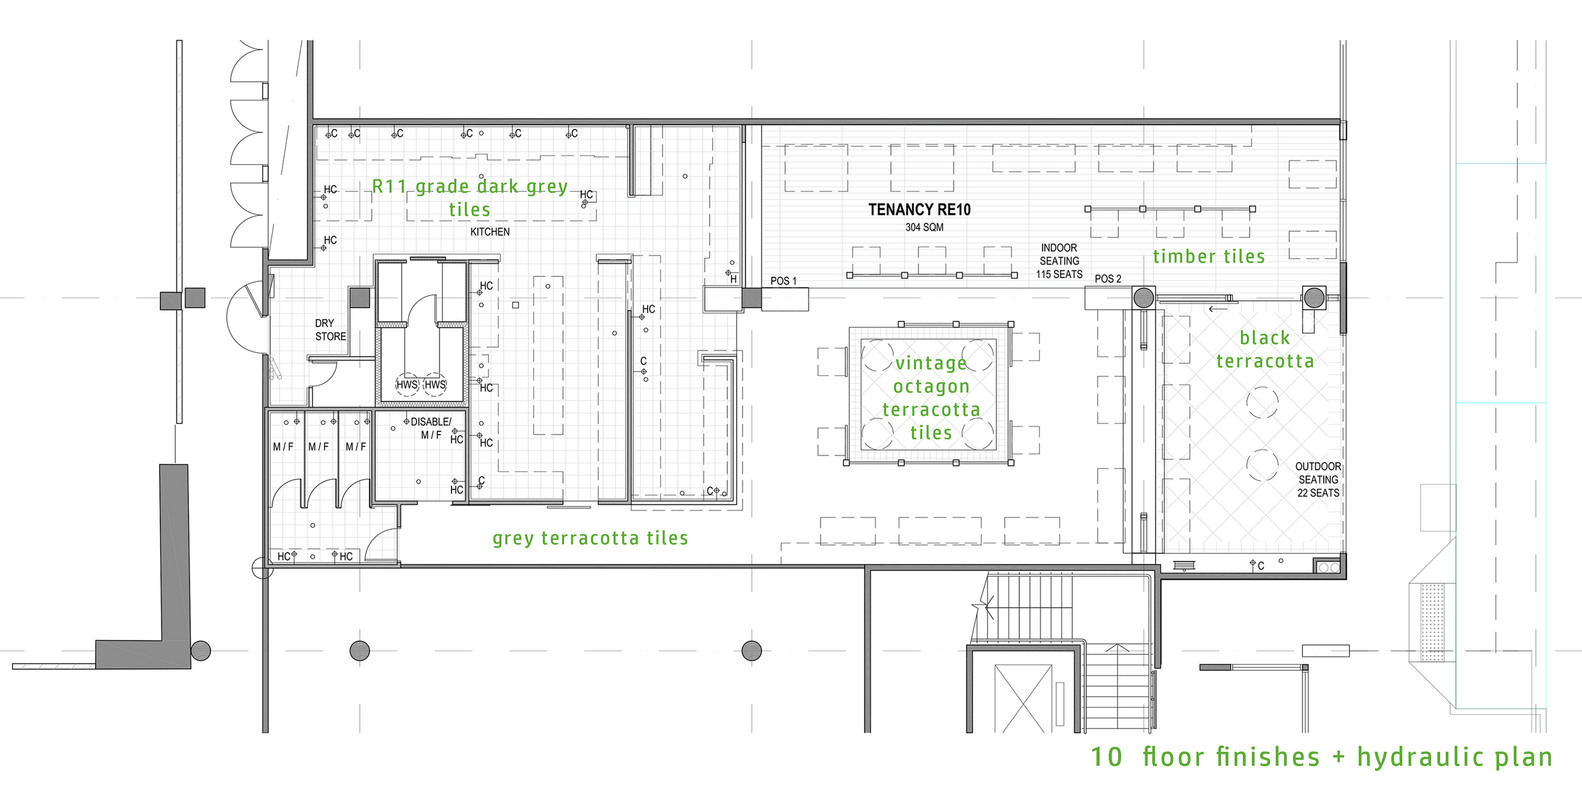 10_floor_finishes___hydraulic_plan